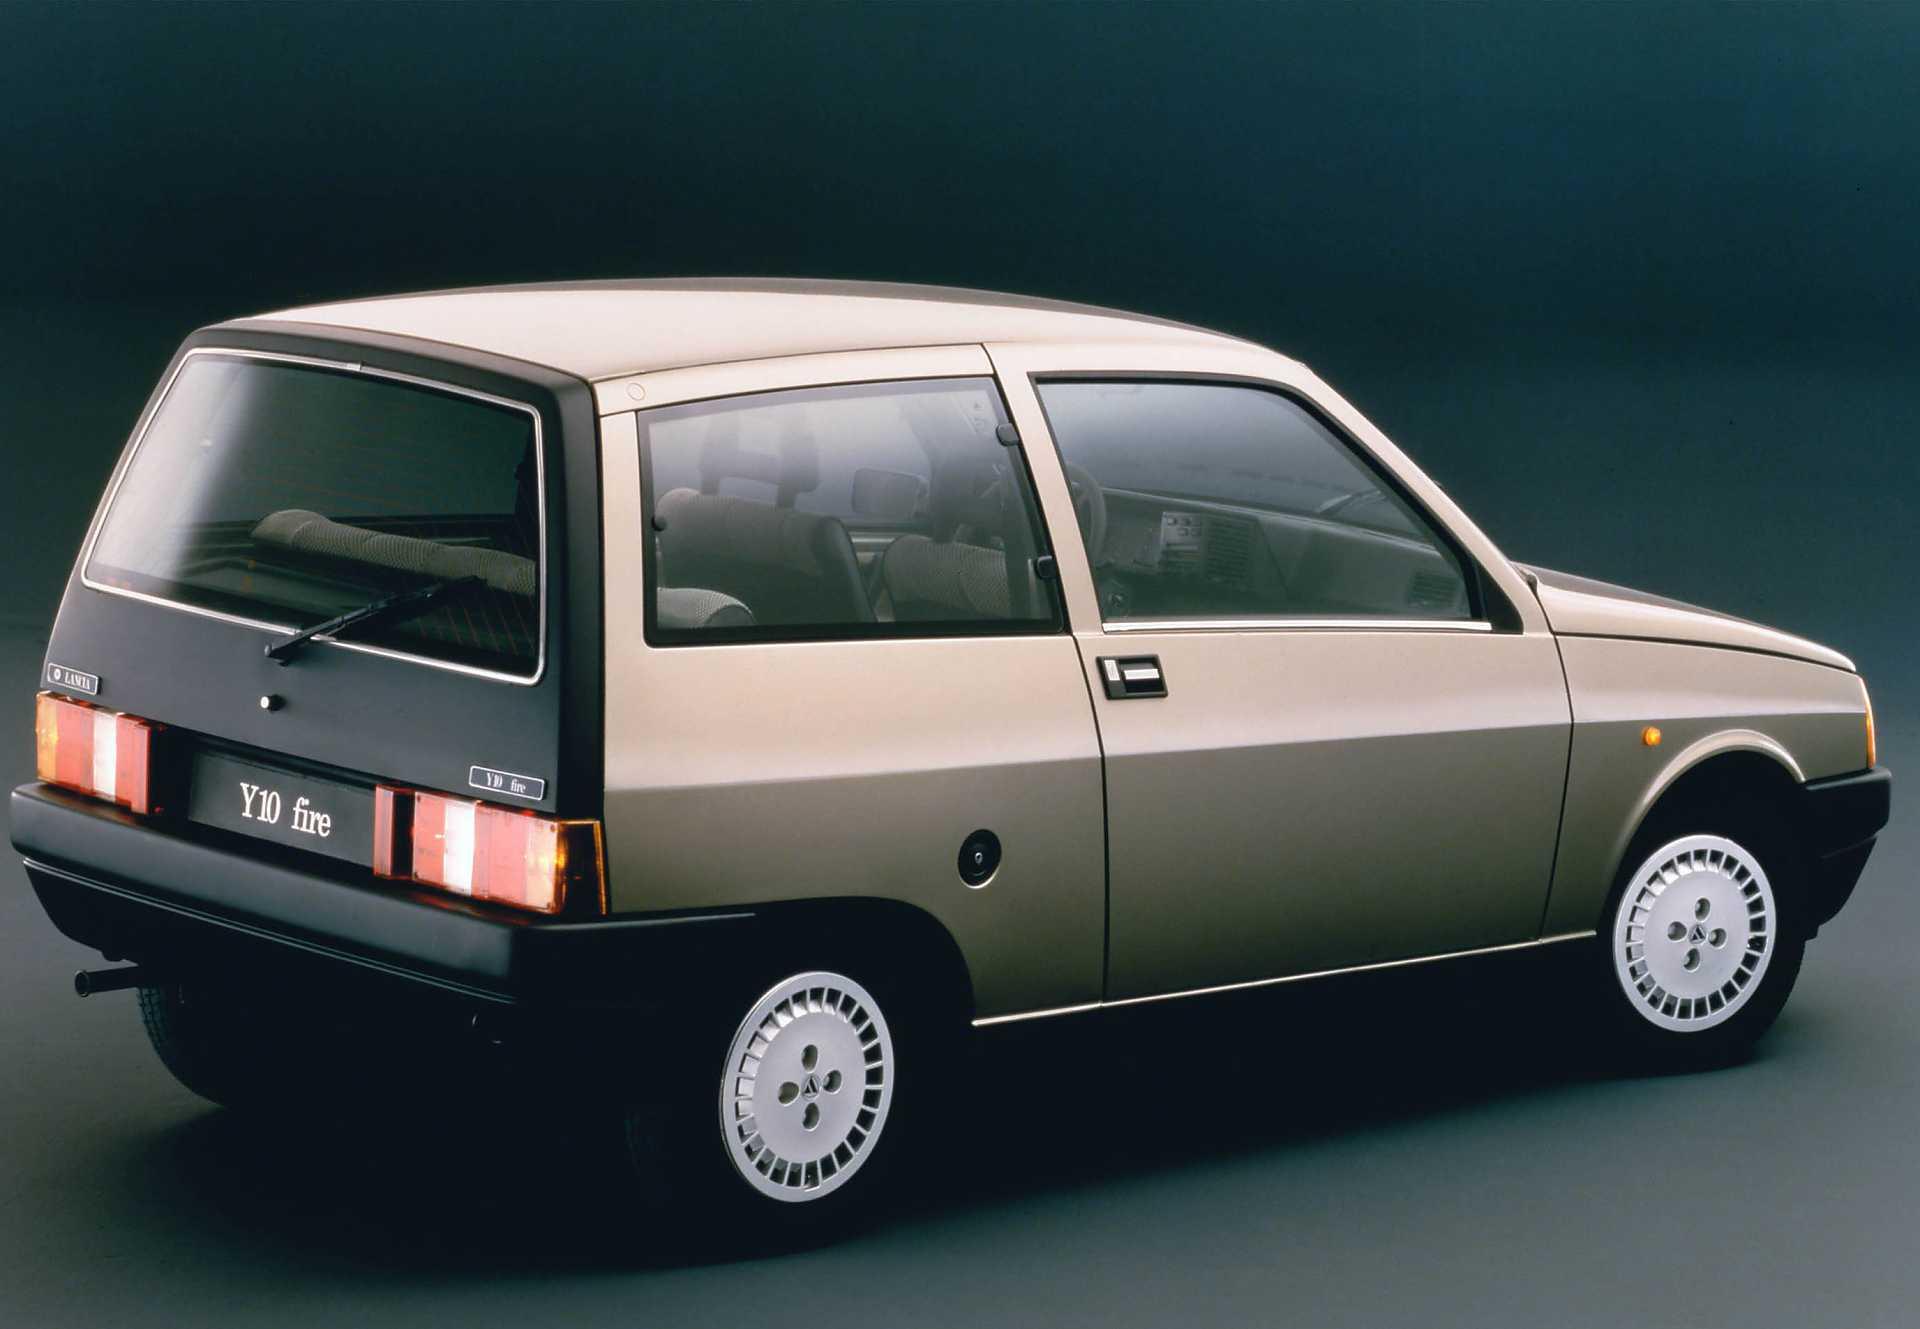 Lancia Y10 1985 - 1995 Hatchback 3 door #1